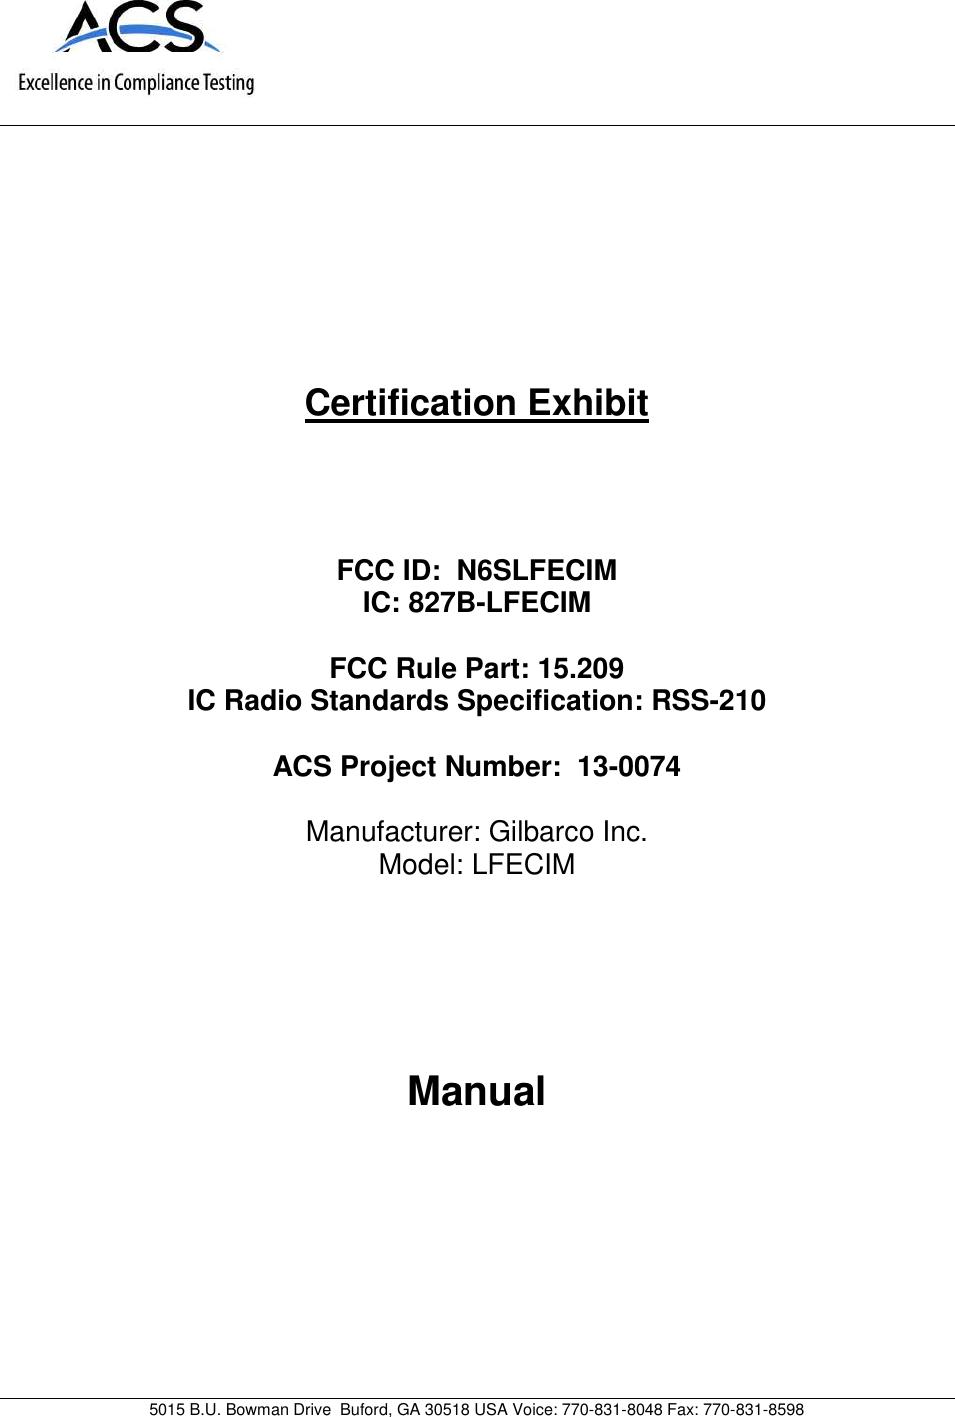 User Guide 1926000 Page 1 gilbarco lfecim rfid module user manual 13 0074 exhibit cover